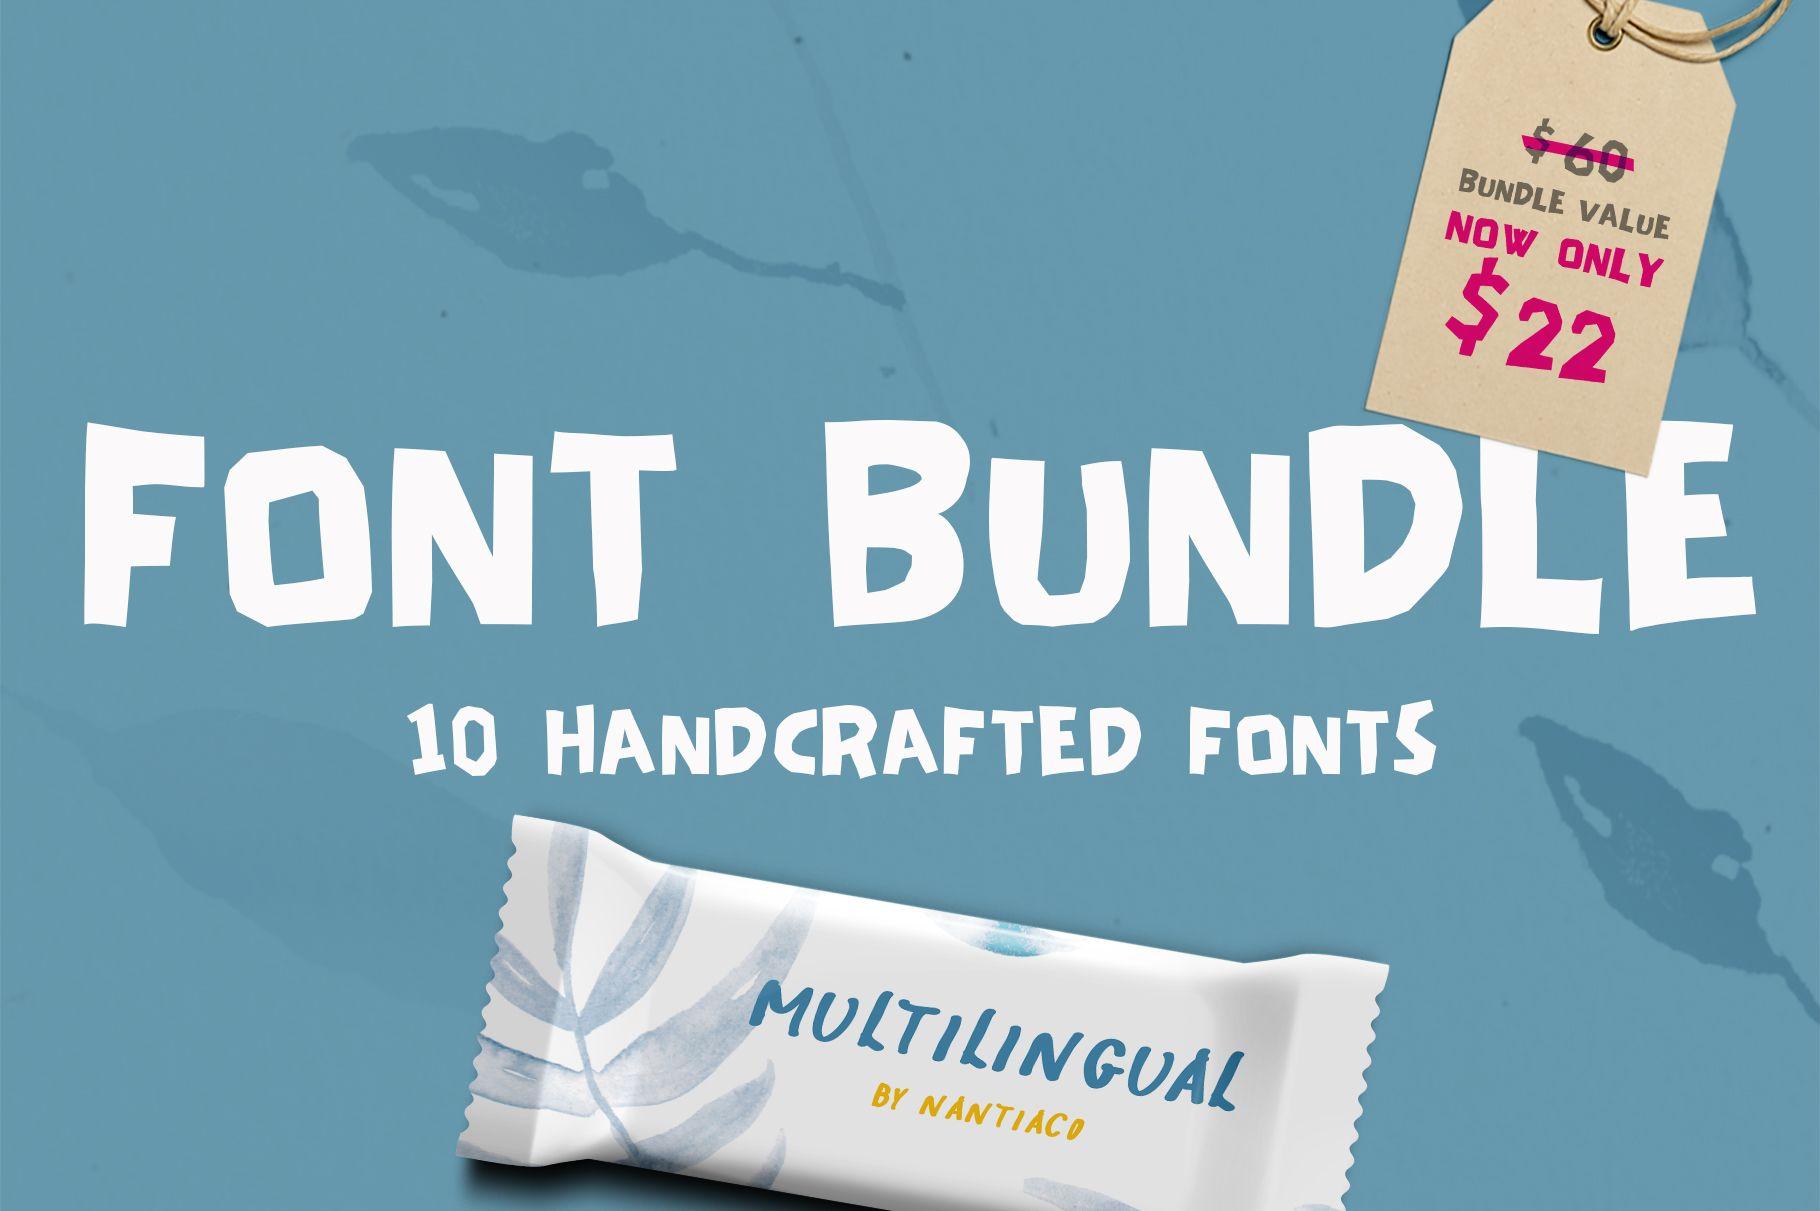 Download Handwritten Font Bundle Pack | Handwritten fonts, Baby ...